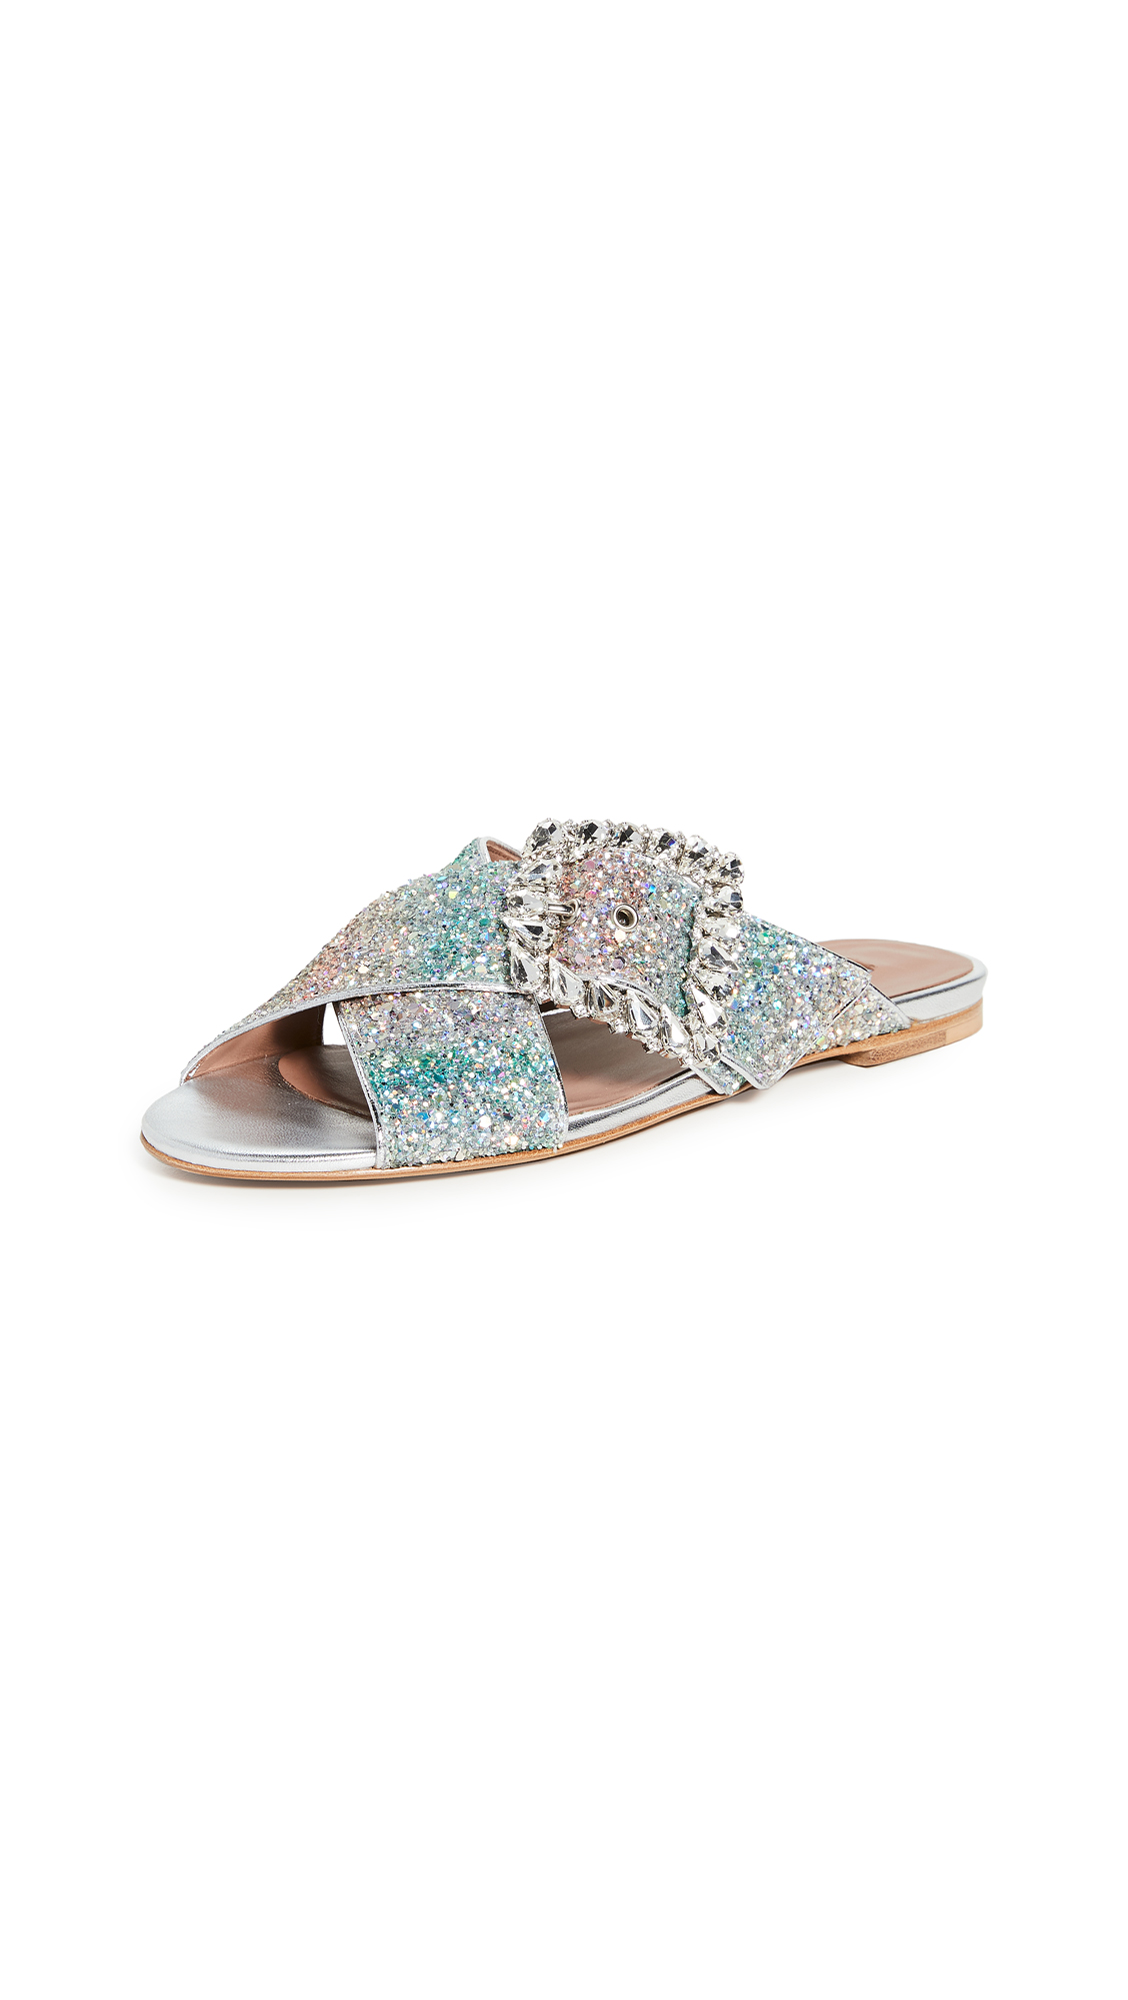 Tabitha Simmons Leni Crystal Slides - 60% Off Sale